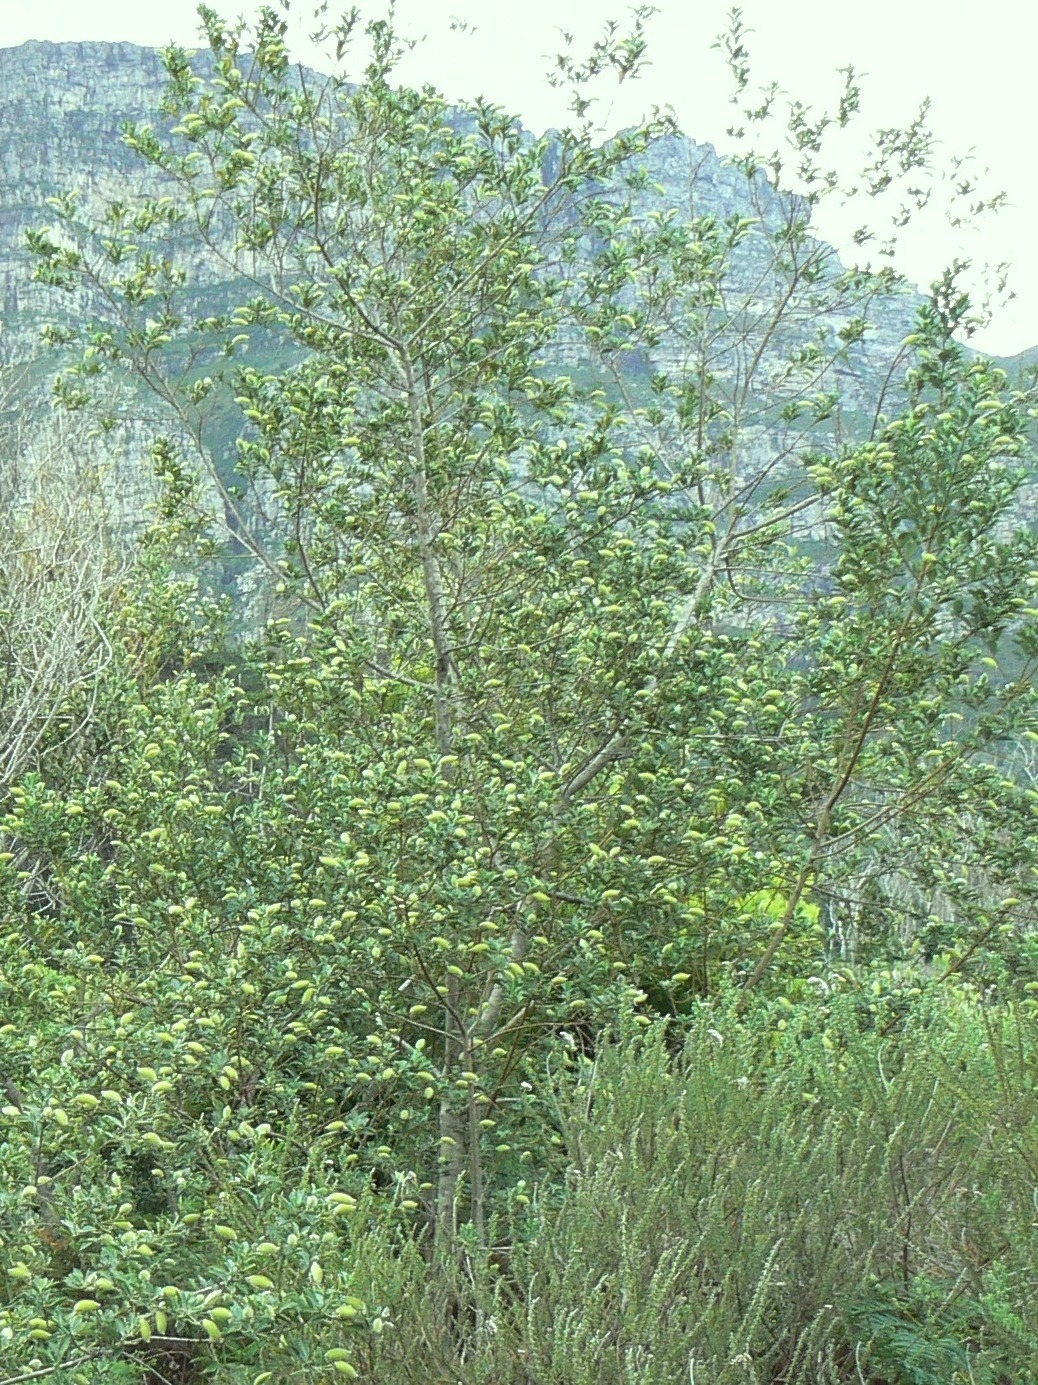 Image of Sweetpea bush